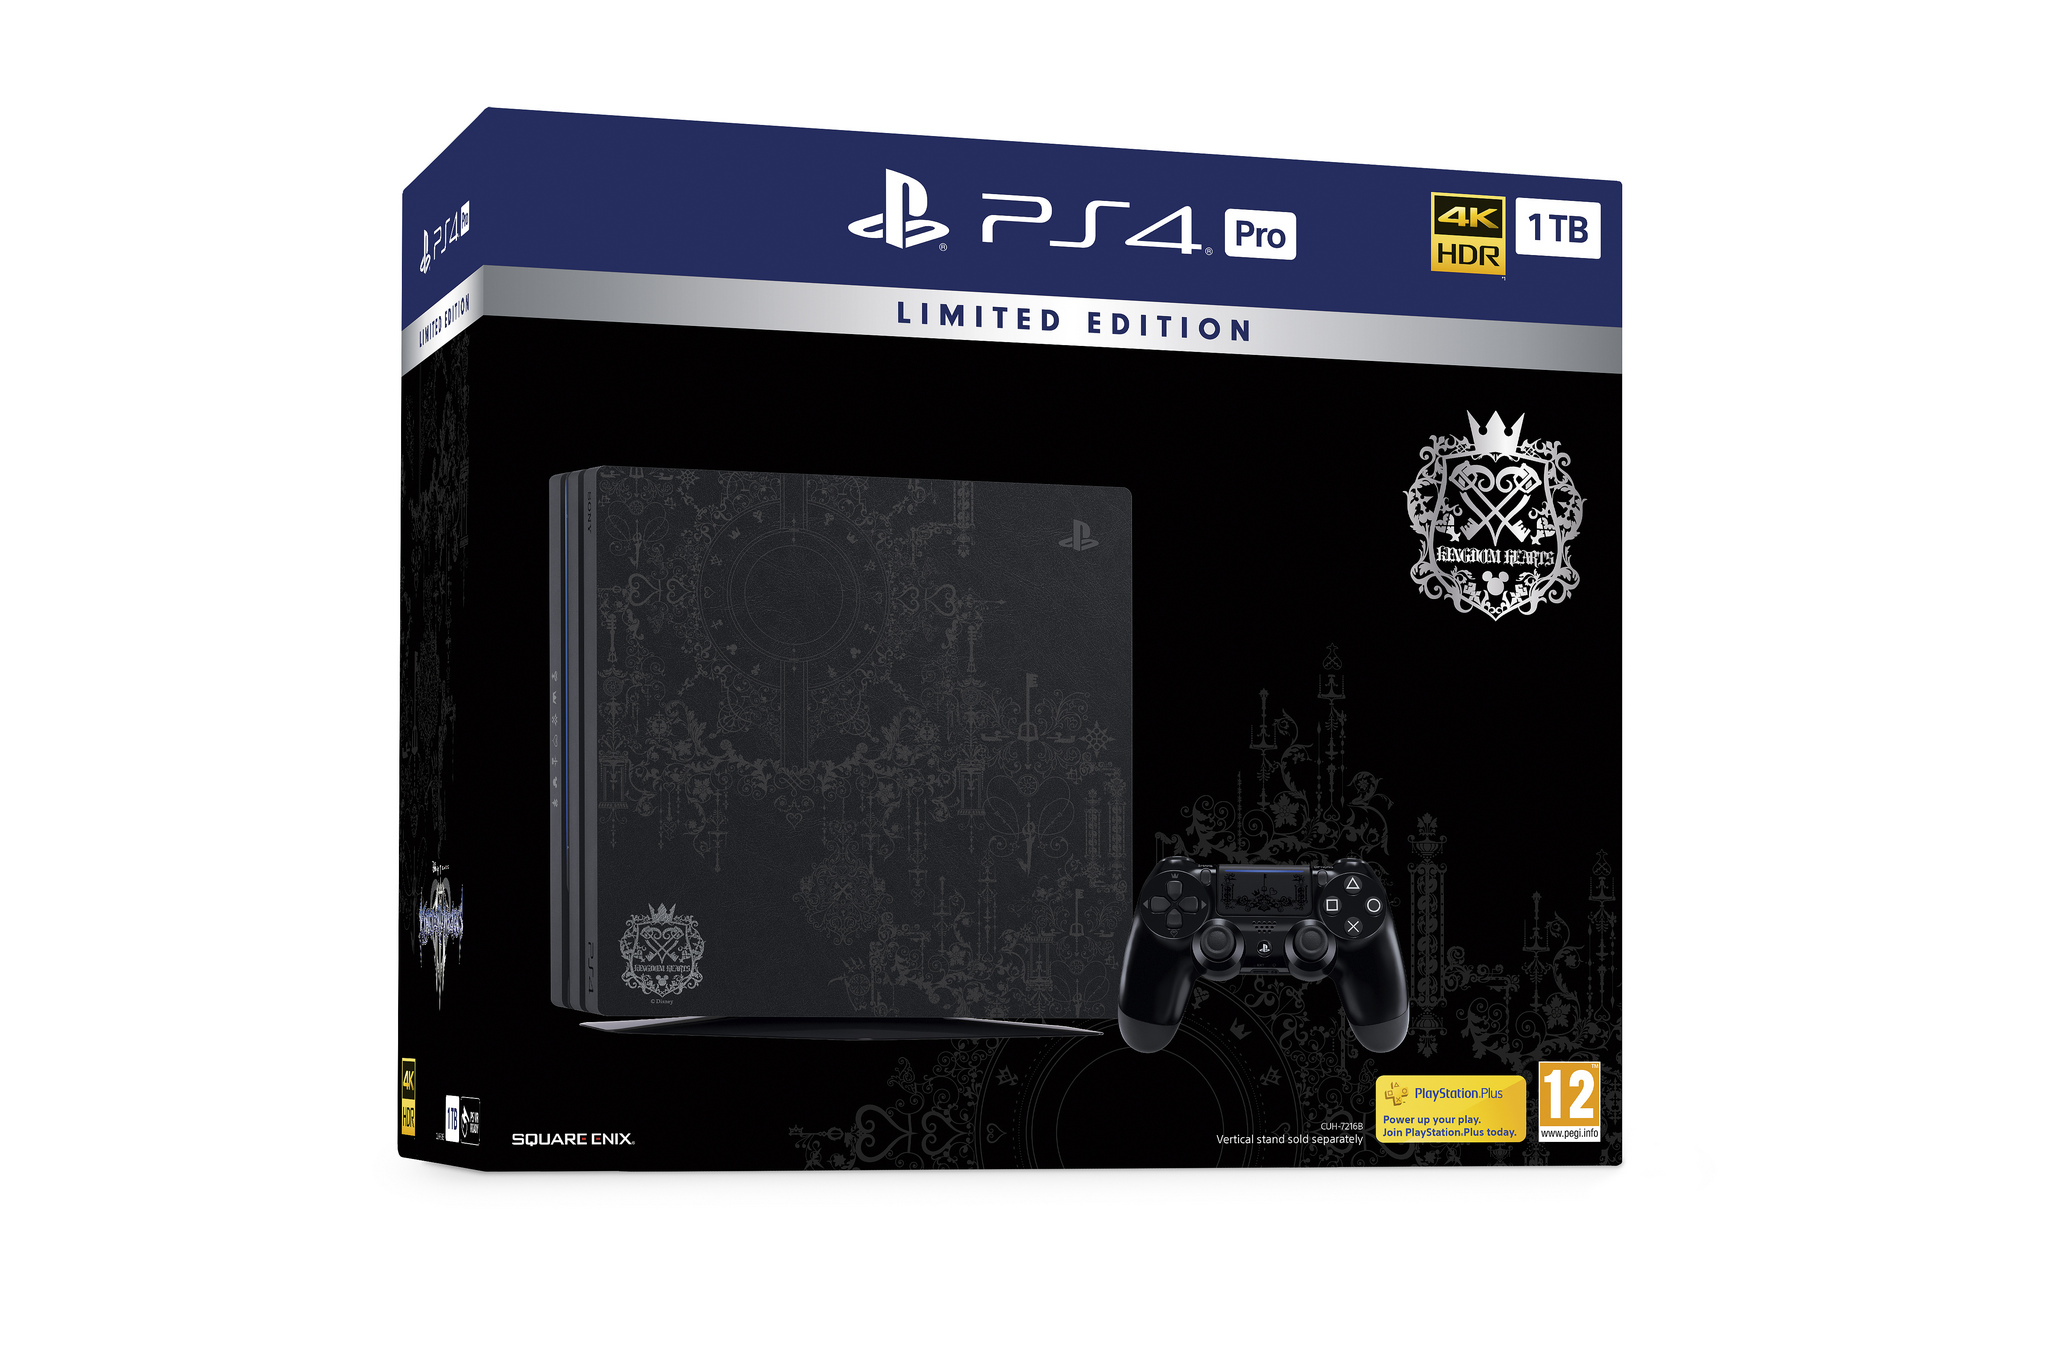 Kingdom Hearts PS4 Pro bundle box